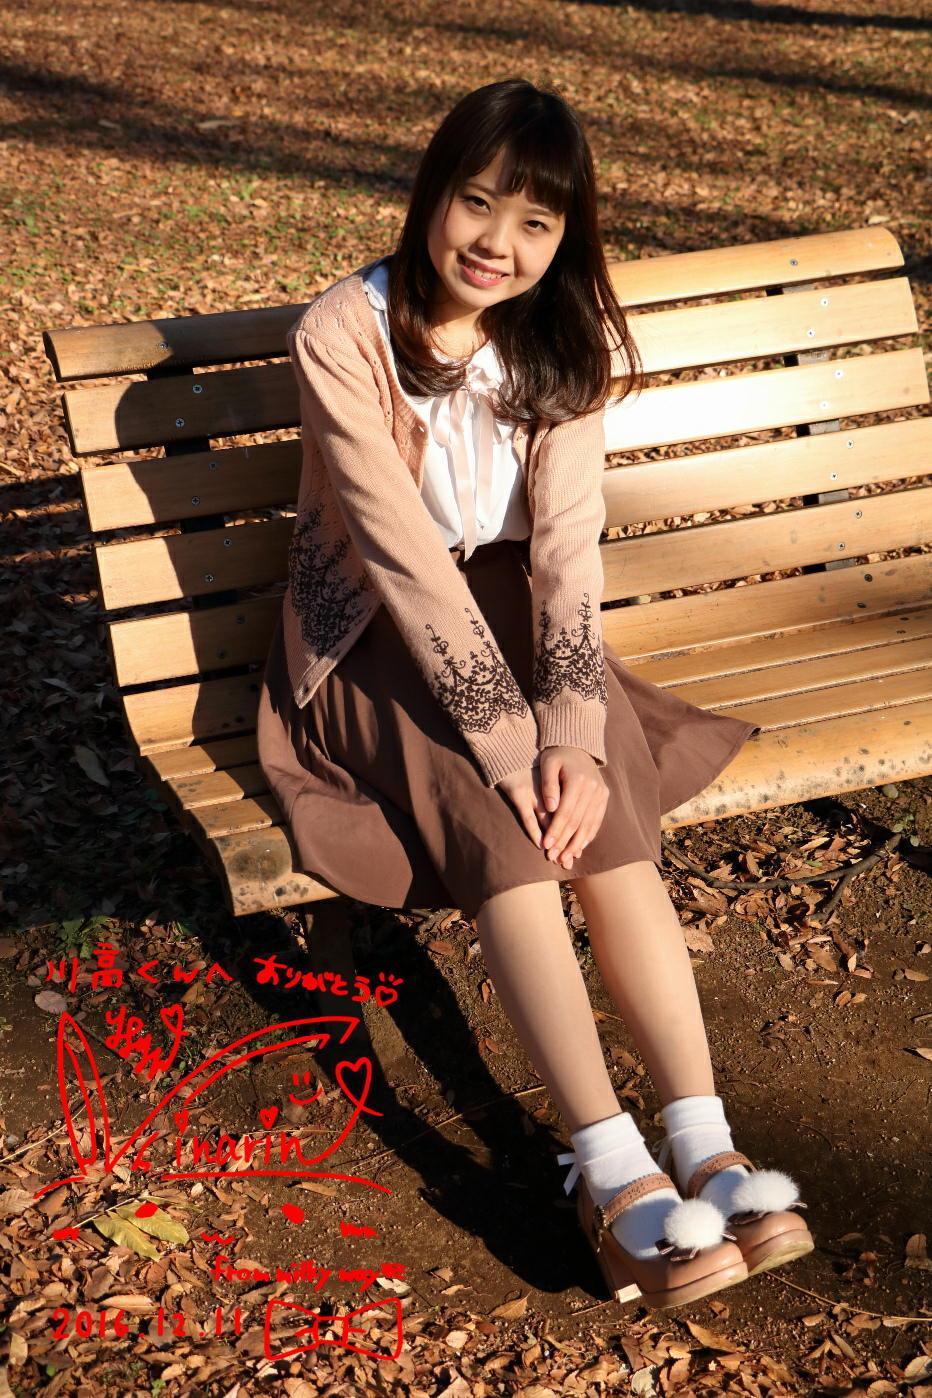 rinarin_favorite_00122.jpg